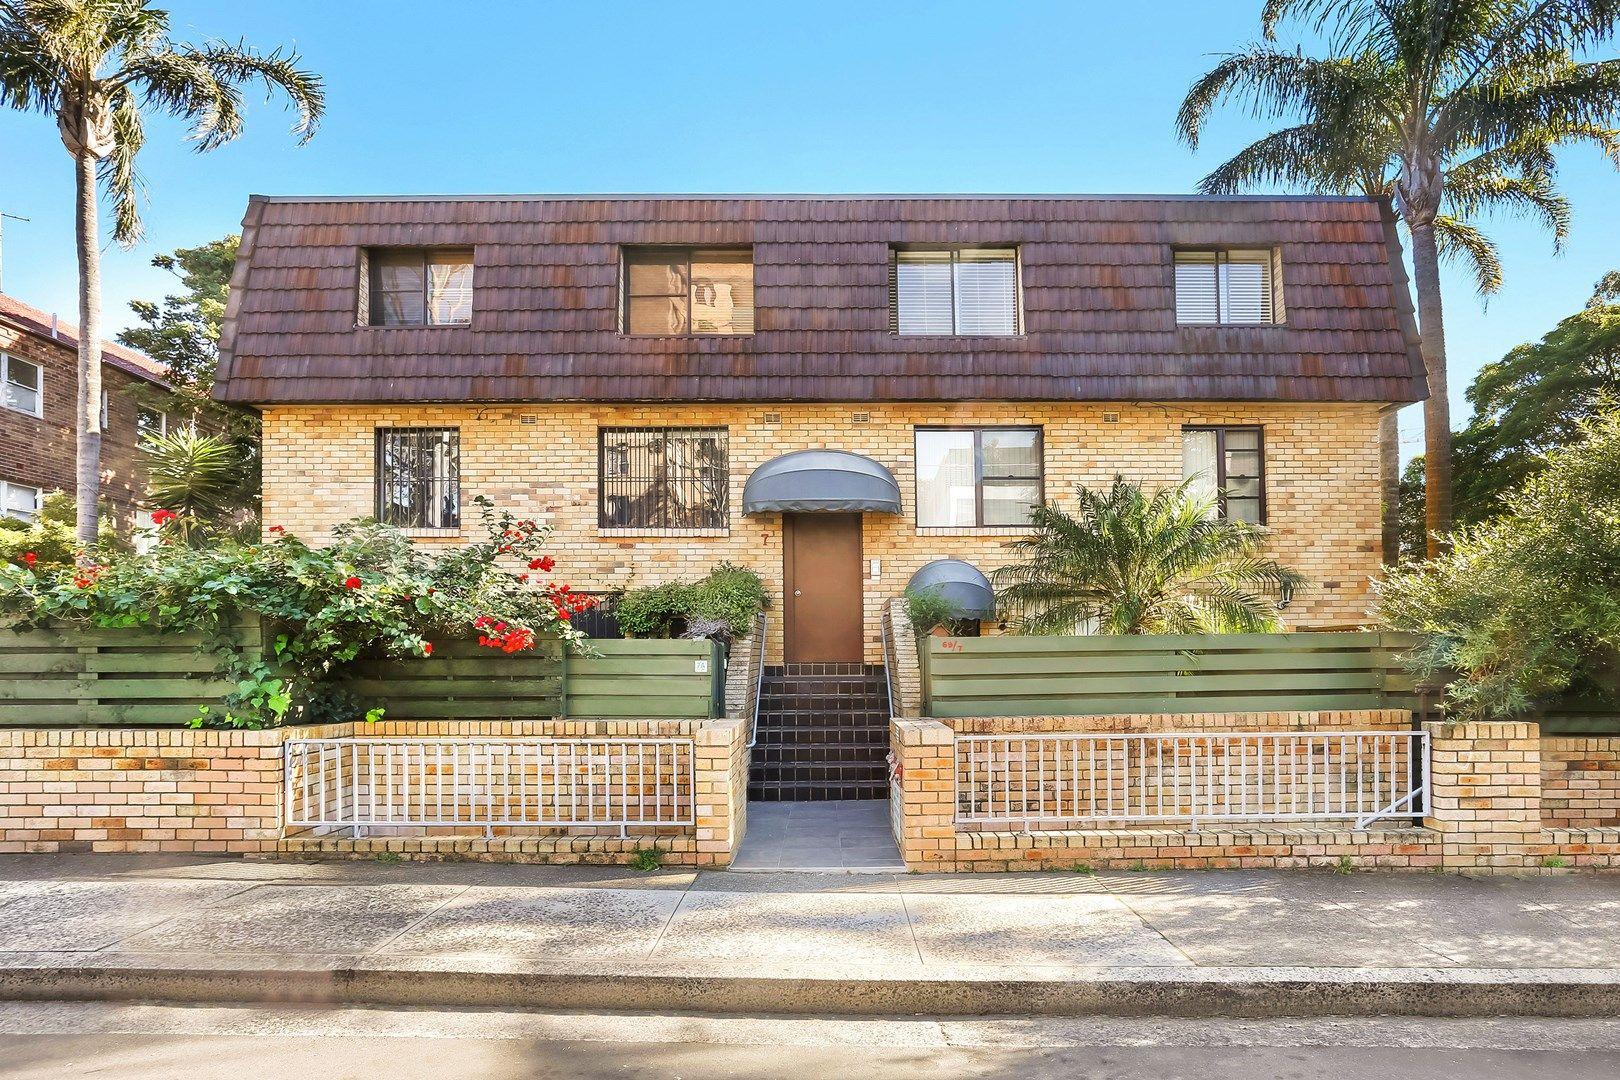 18/7 Botany Street, Bondi Junction NSW 2022, Image 0